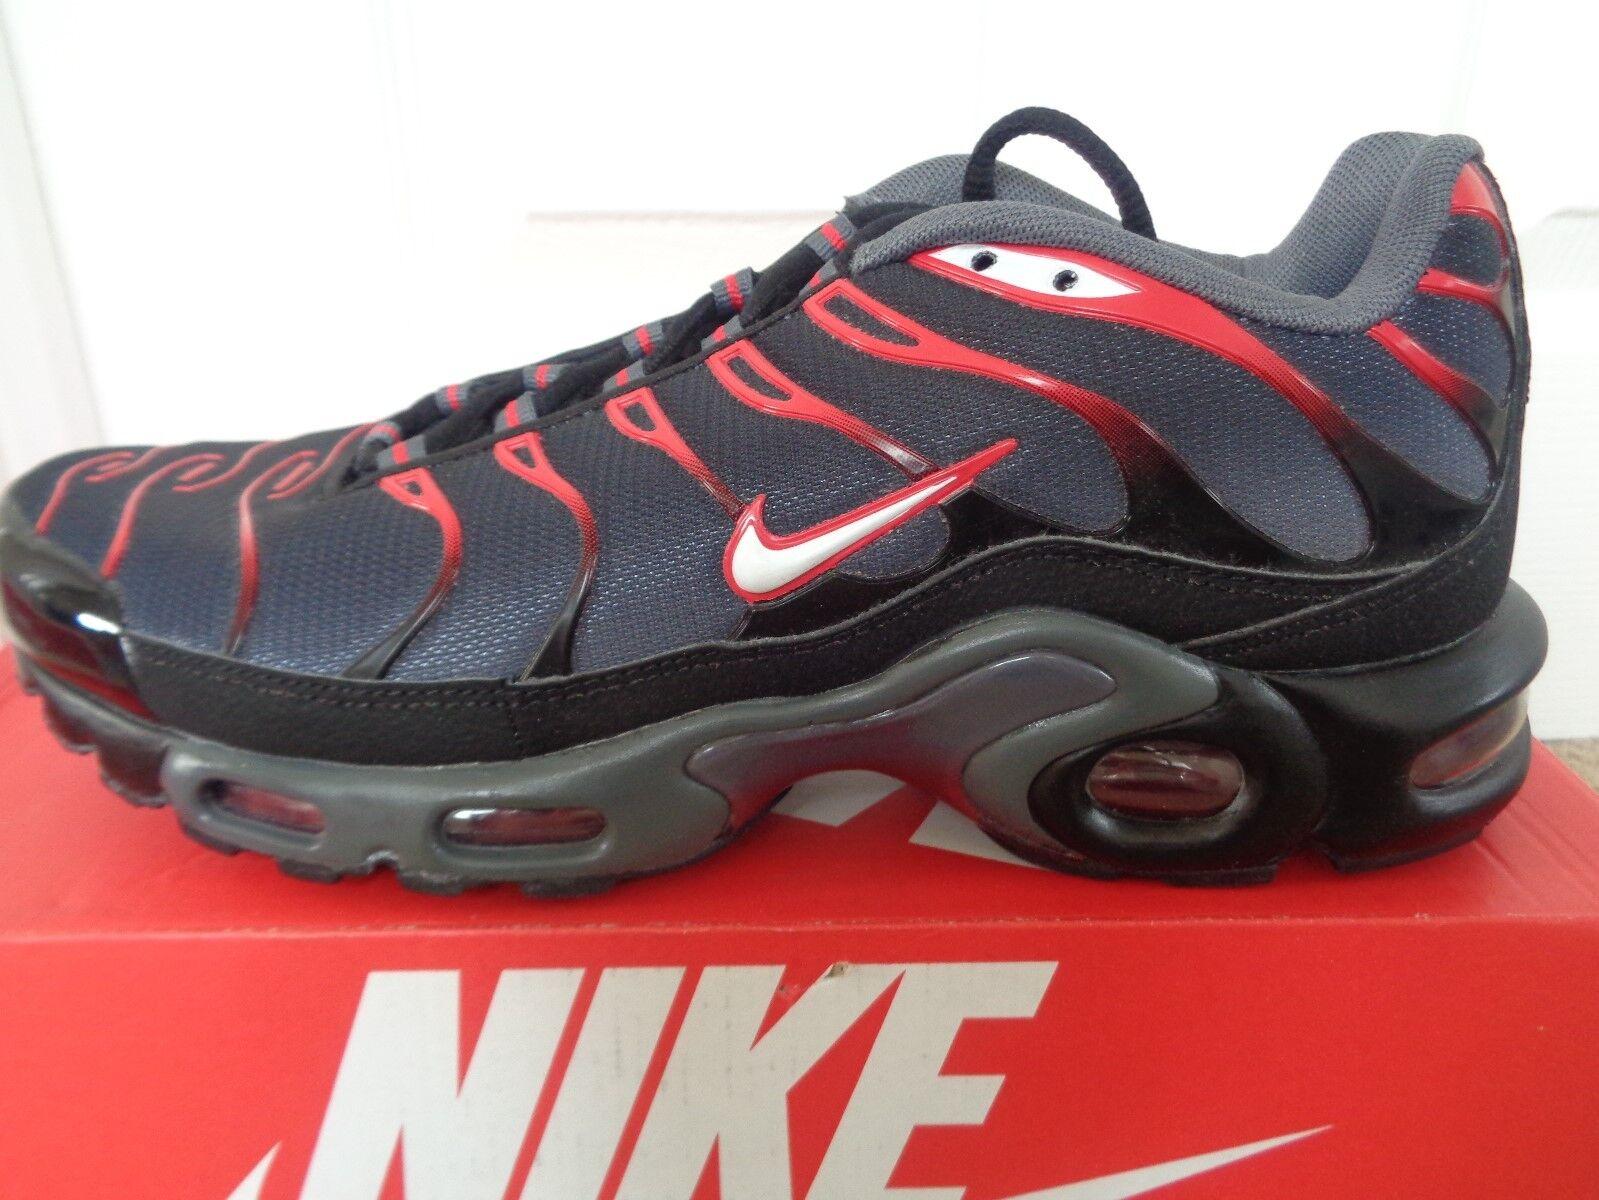 Nike tenis Zapatos  deportivos Zapatos nos  Max Plus Air 852630 002 nos Zapatos 8 Nuevo  Caja 97cbe2